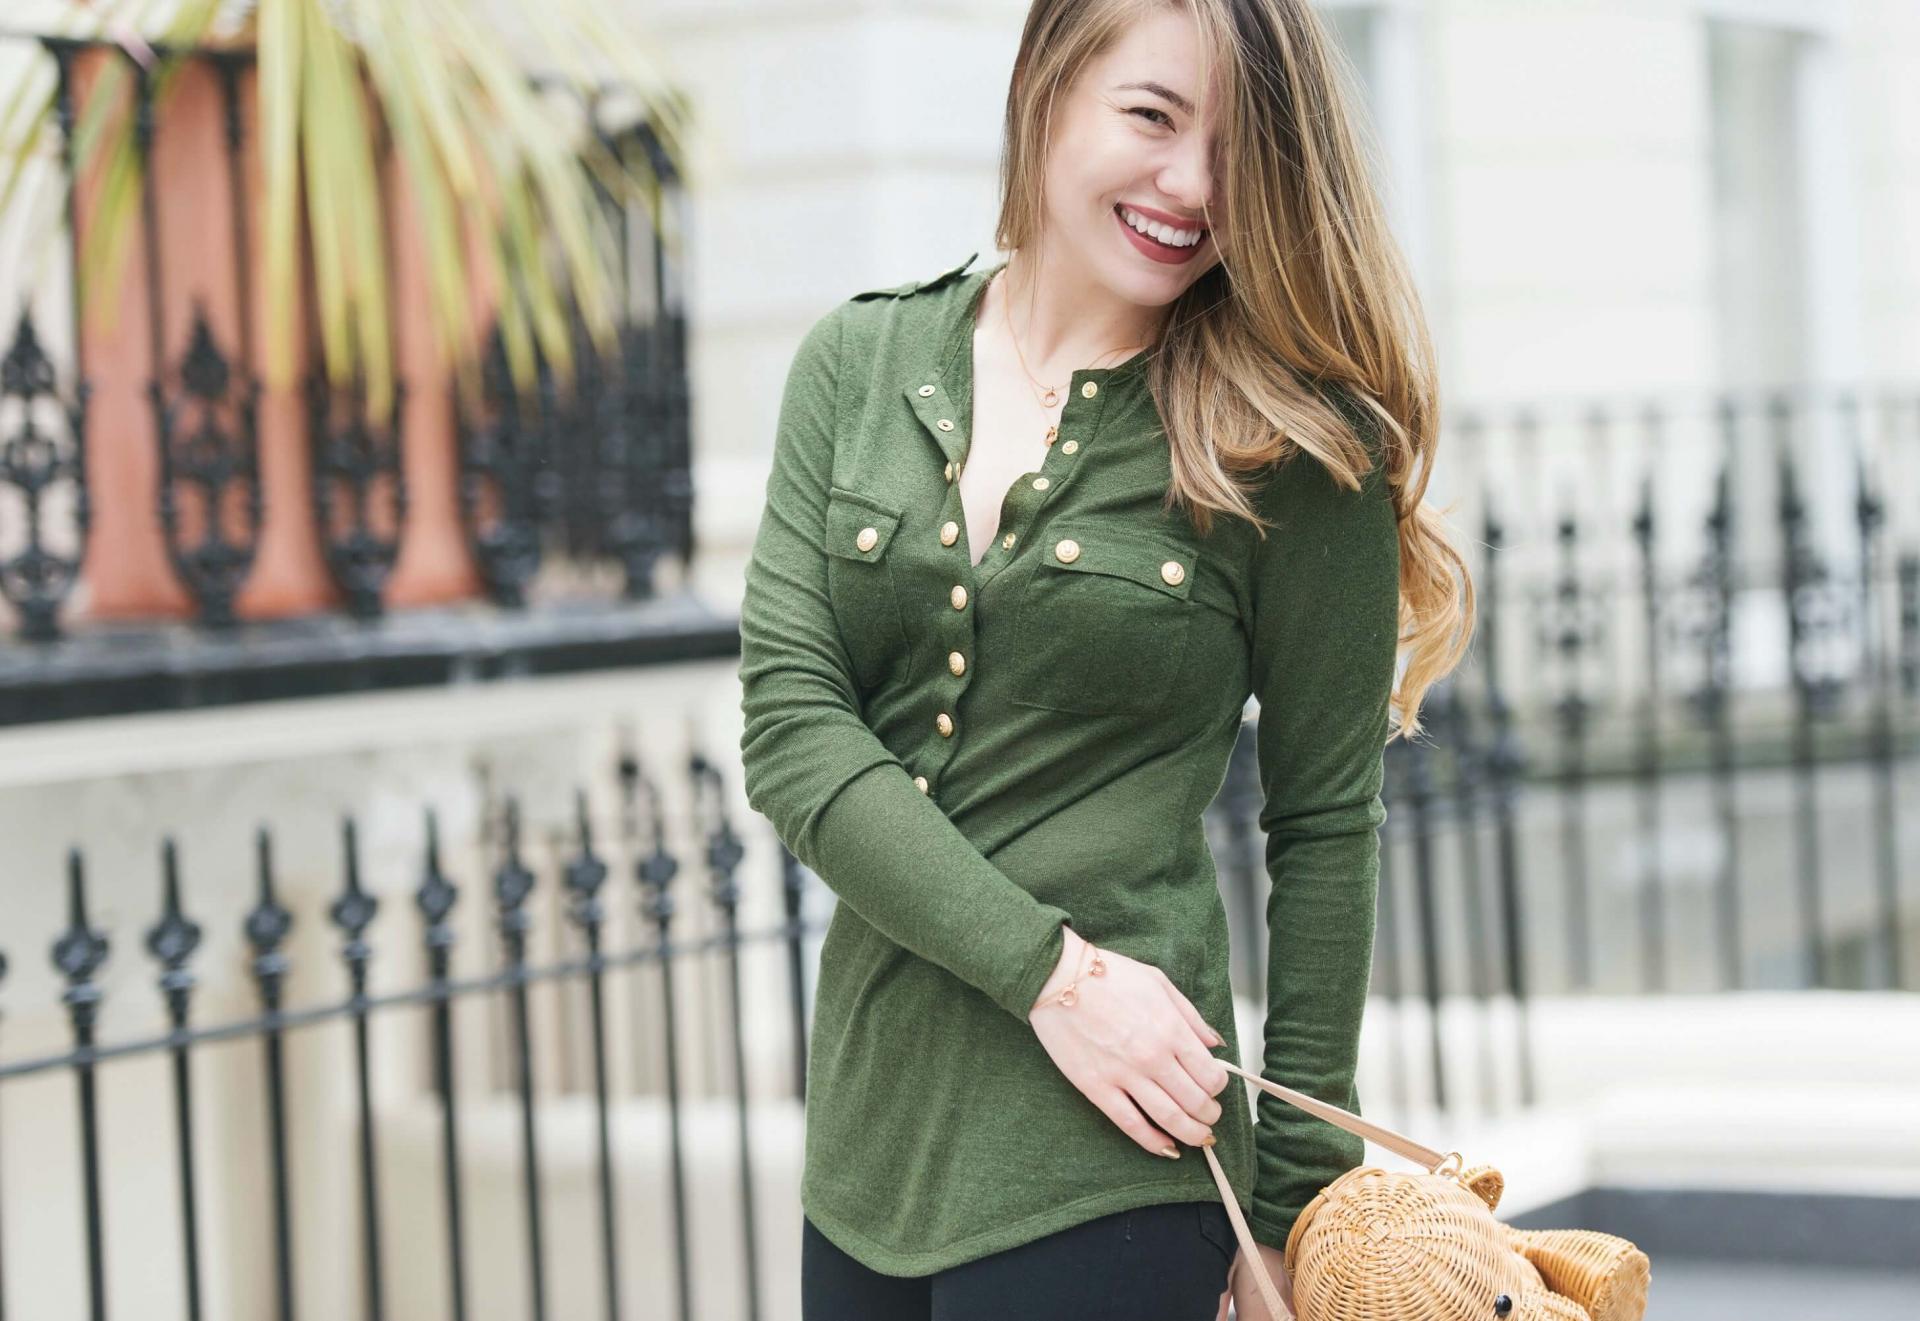 How to style Balmain clothes